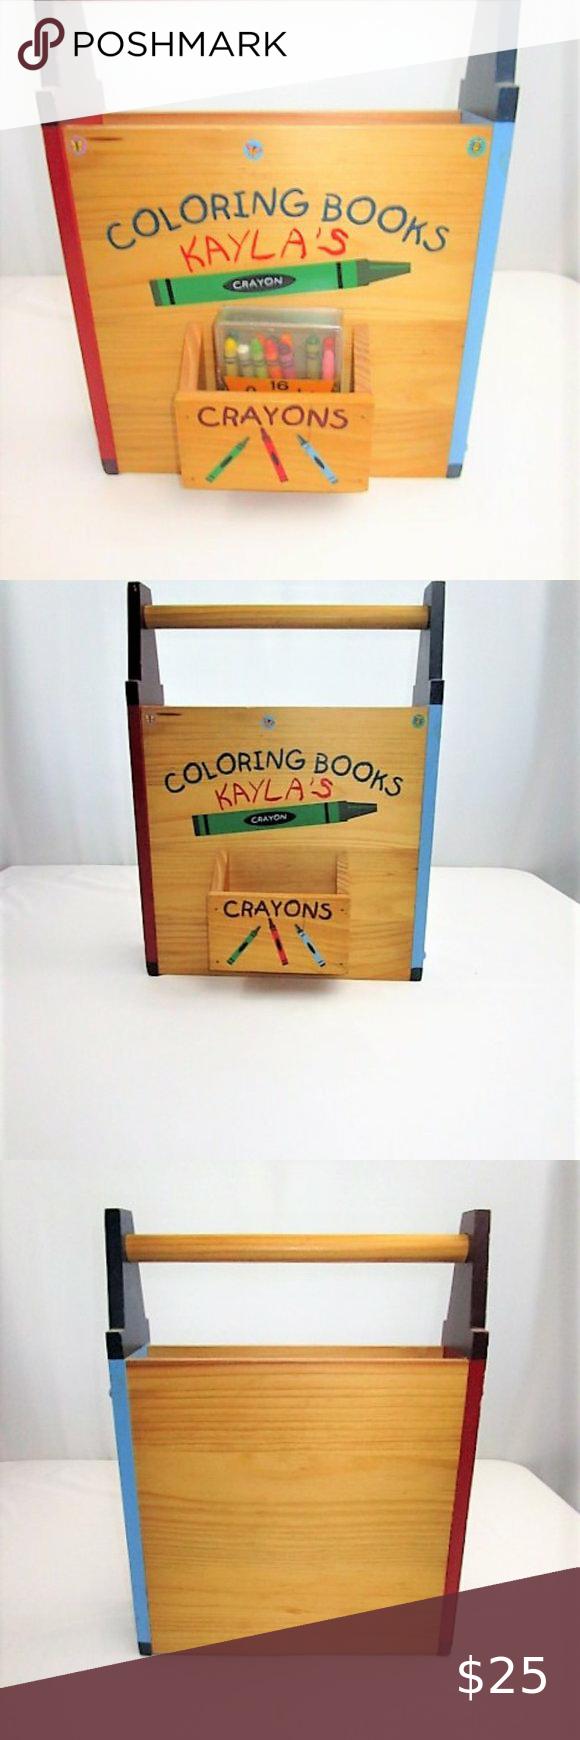 Wooden Coloring Book And Crayon Box Crayon Box Coloring Books Crayola Toys